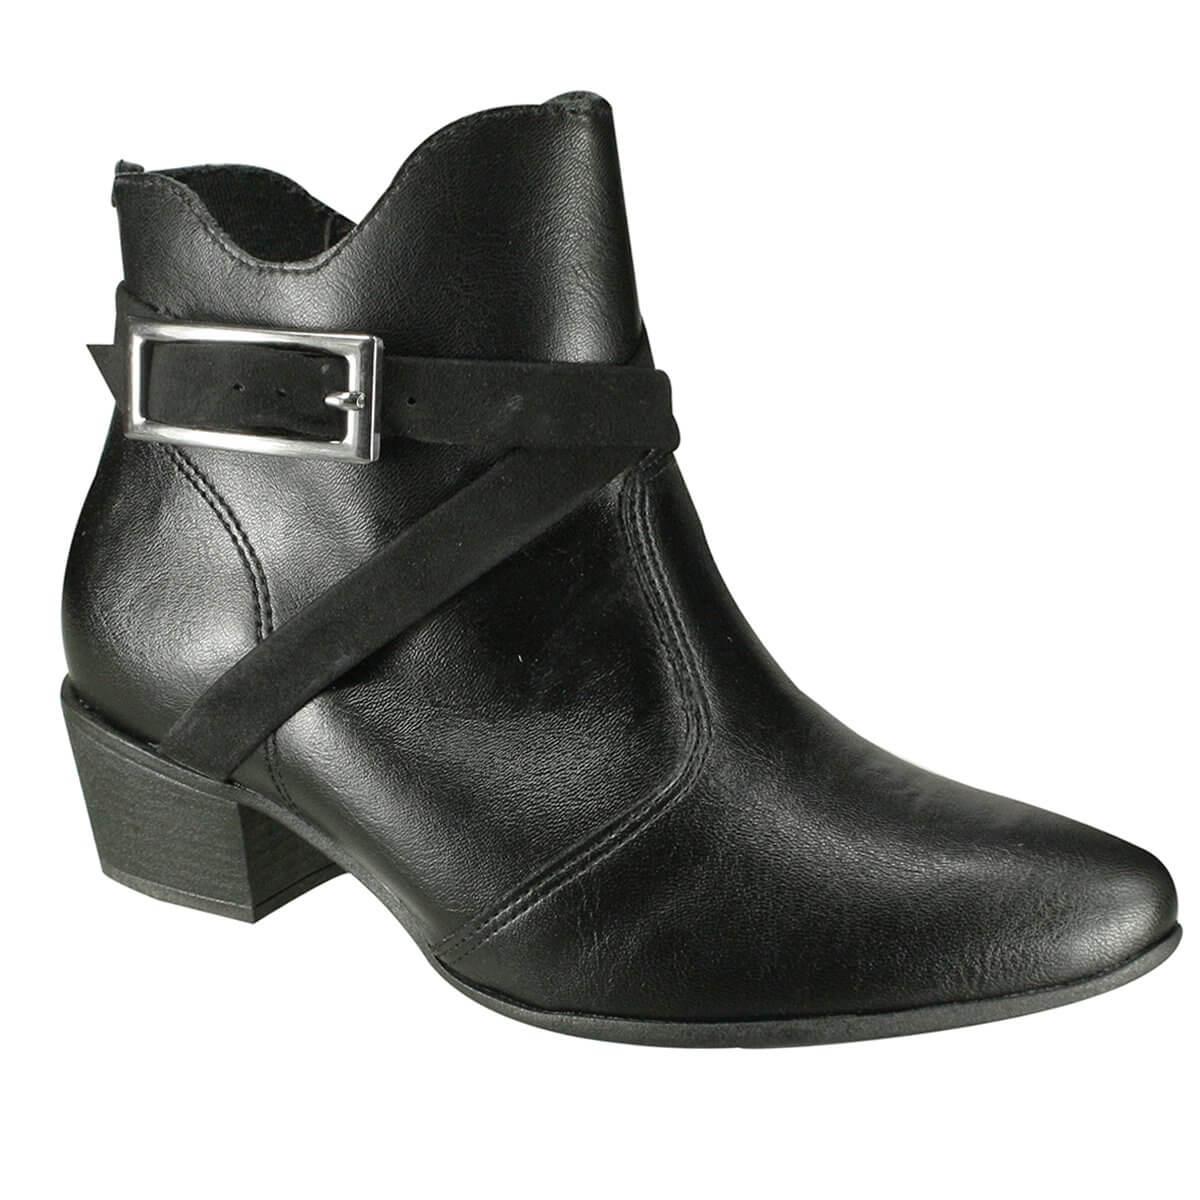 fb5e307a8 Bota Feminina Ramarim Ankle Boot 19-62103 000004 - Preto (Vest ...